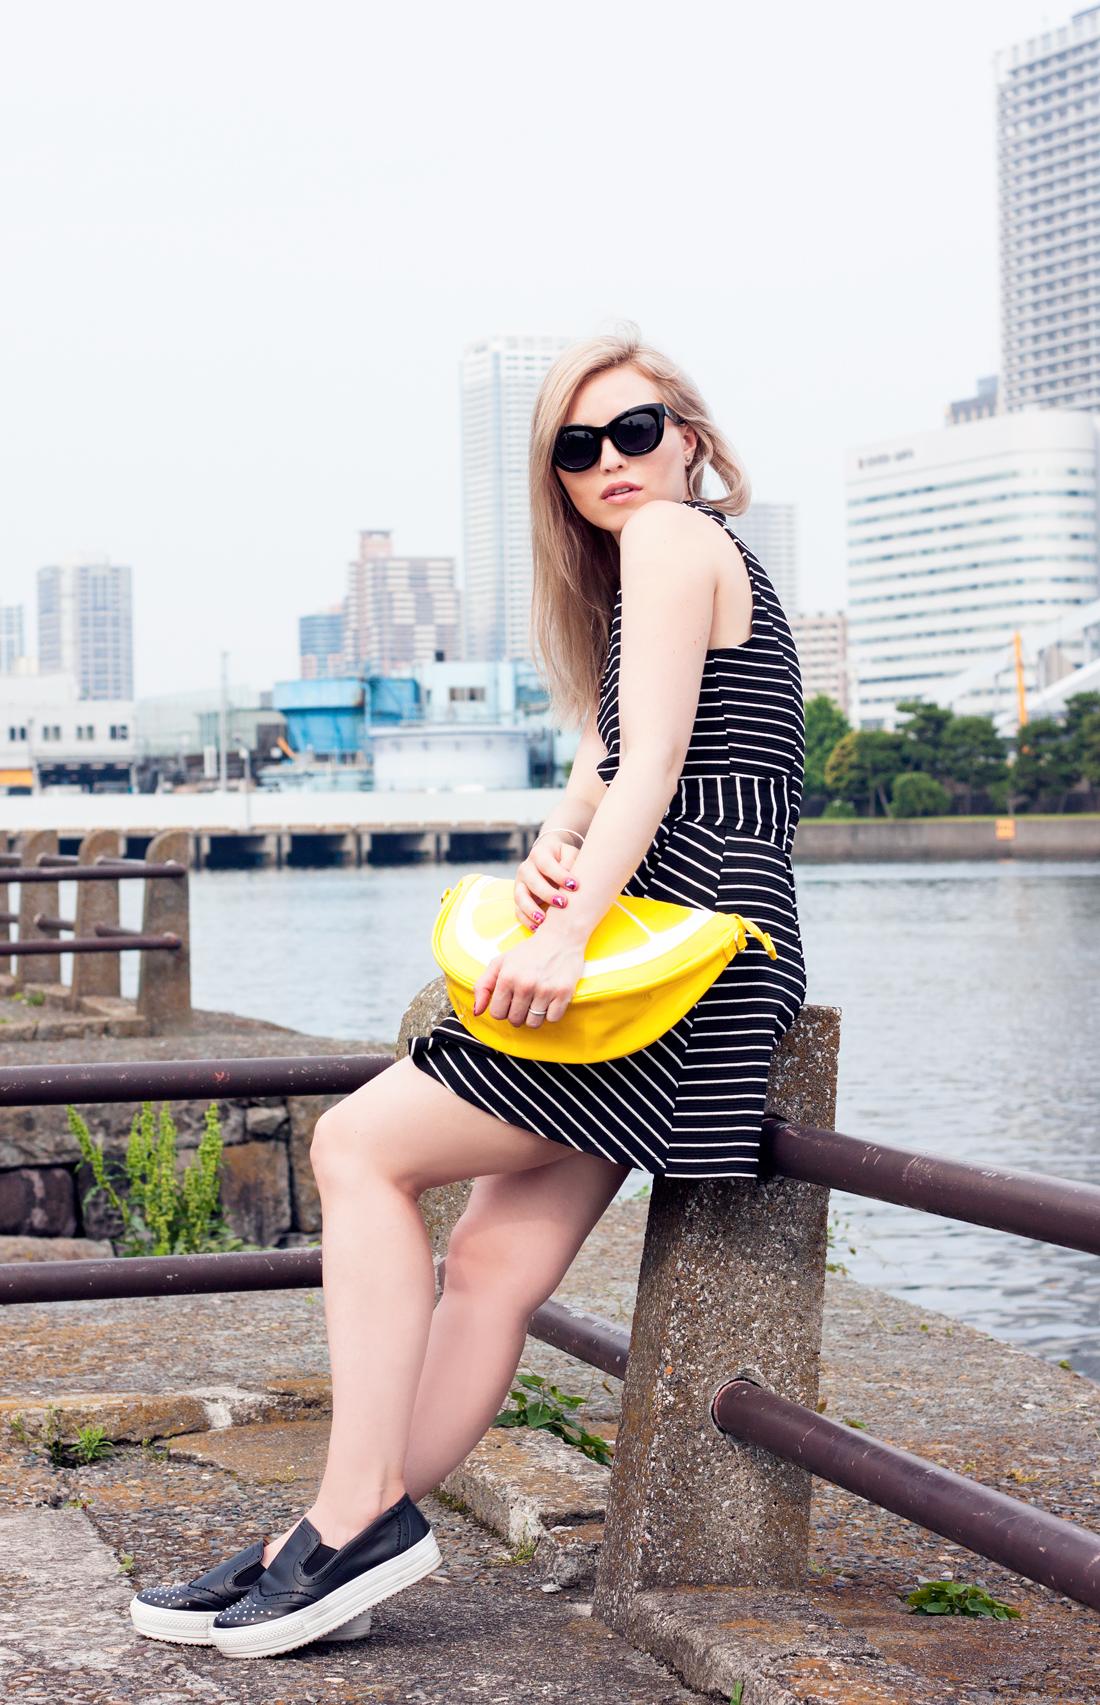 Lemon clutch, hama-rikyu garden, tokyo, japan, tokyo fashion, lemon, barbie nails, nail stickers, platform sneakers, cat eye sunglasses